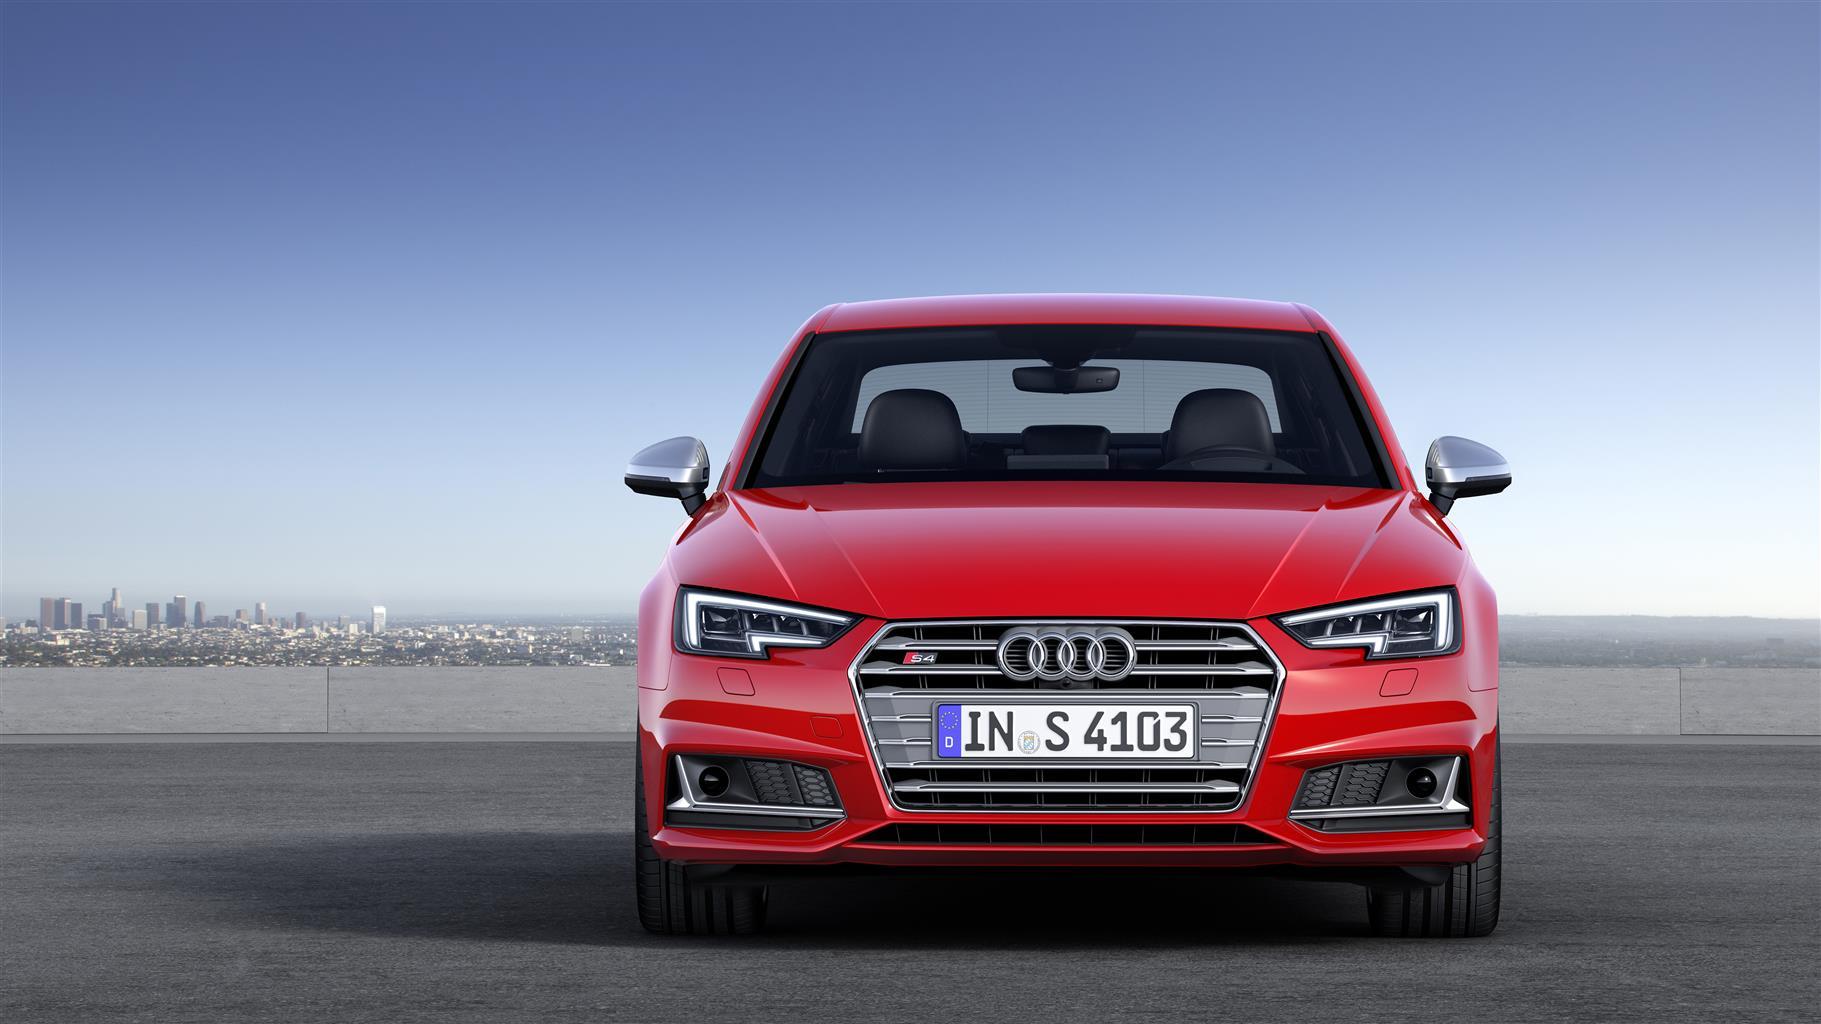 Nuove Audi S4 ed S4 Avant